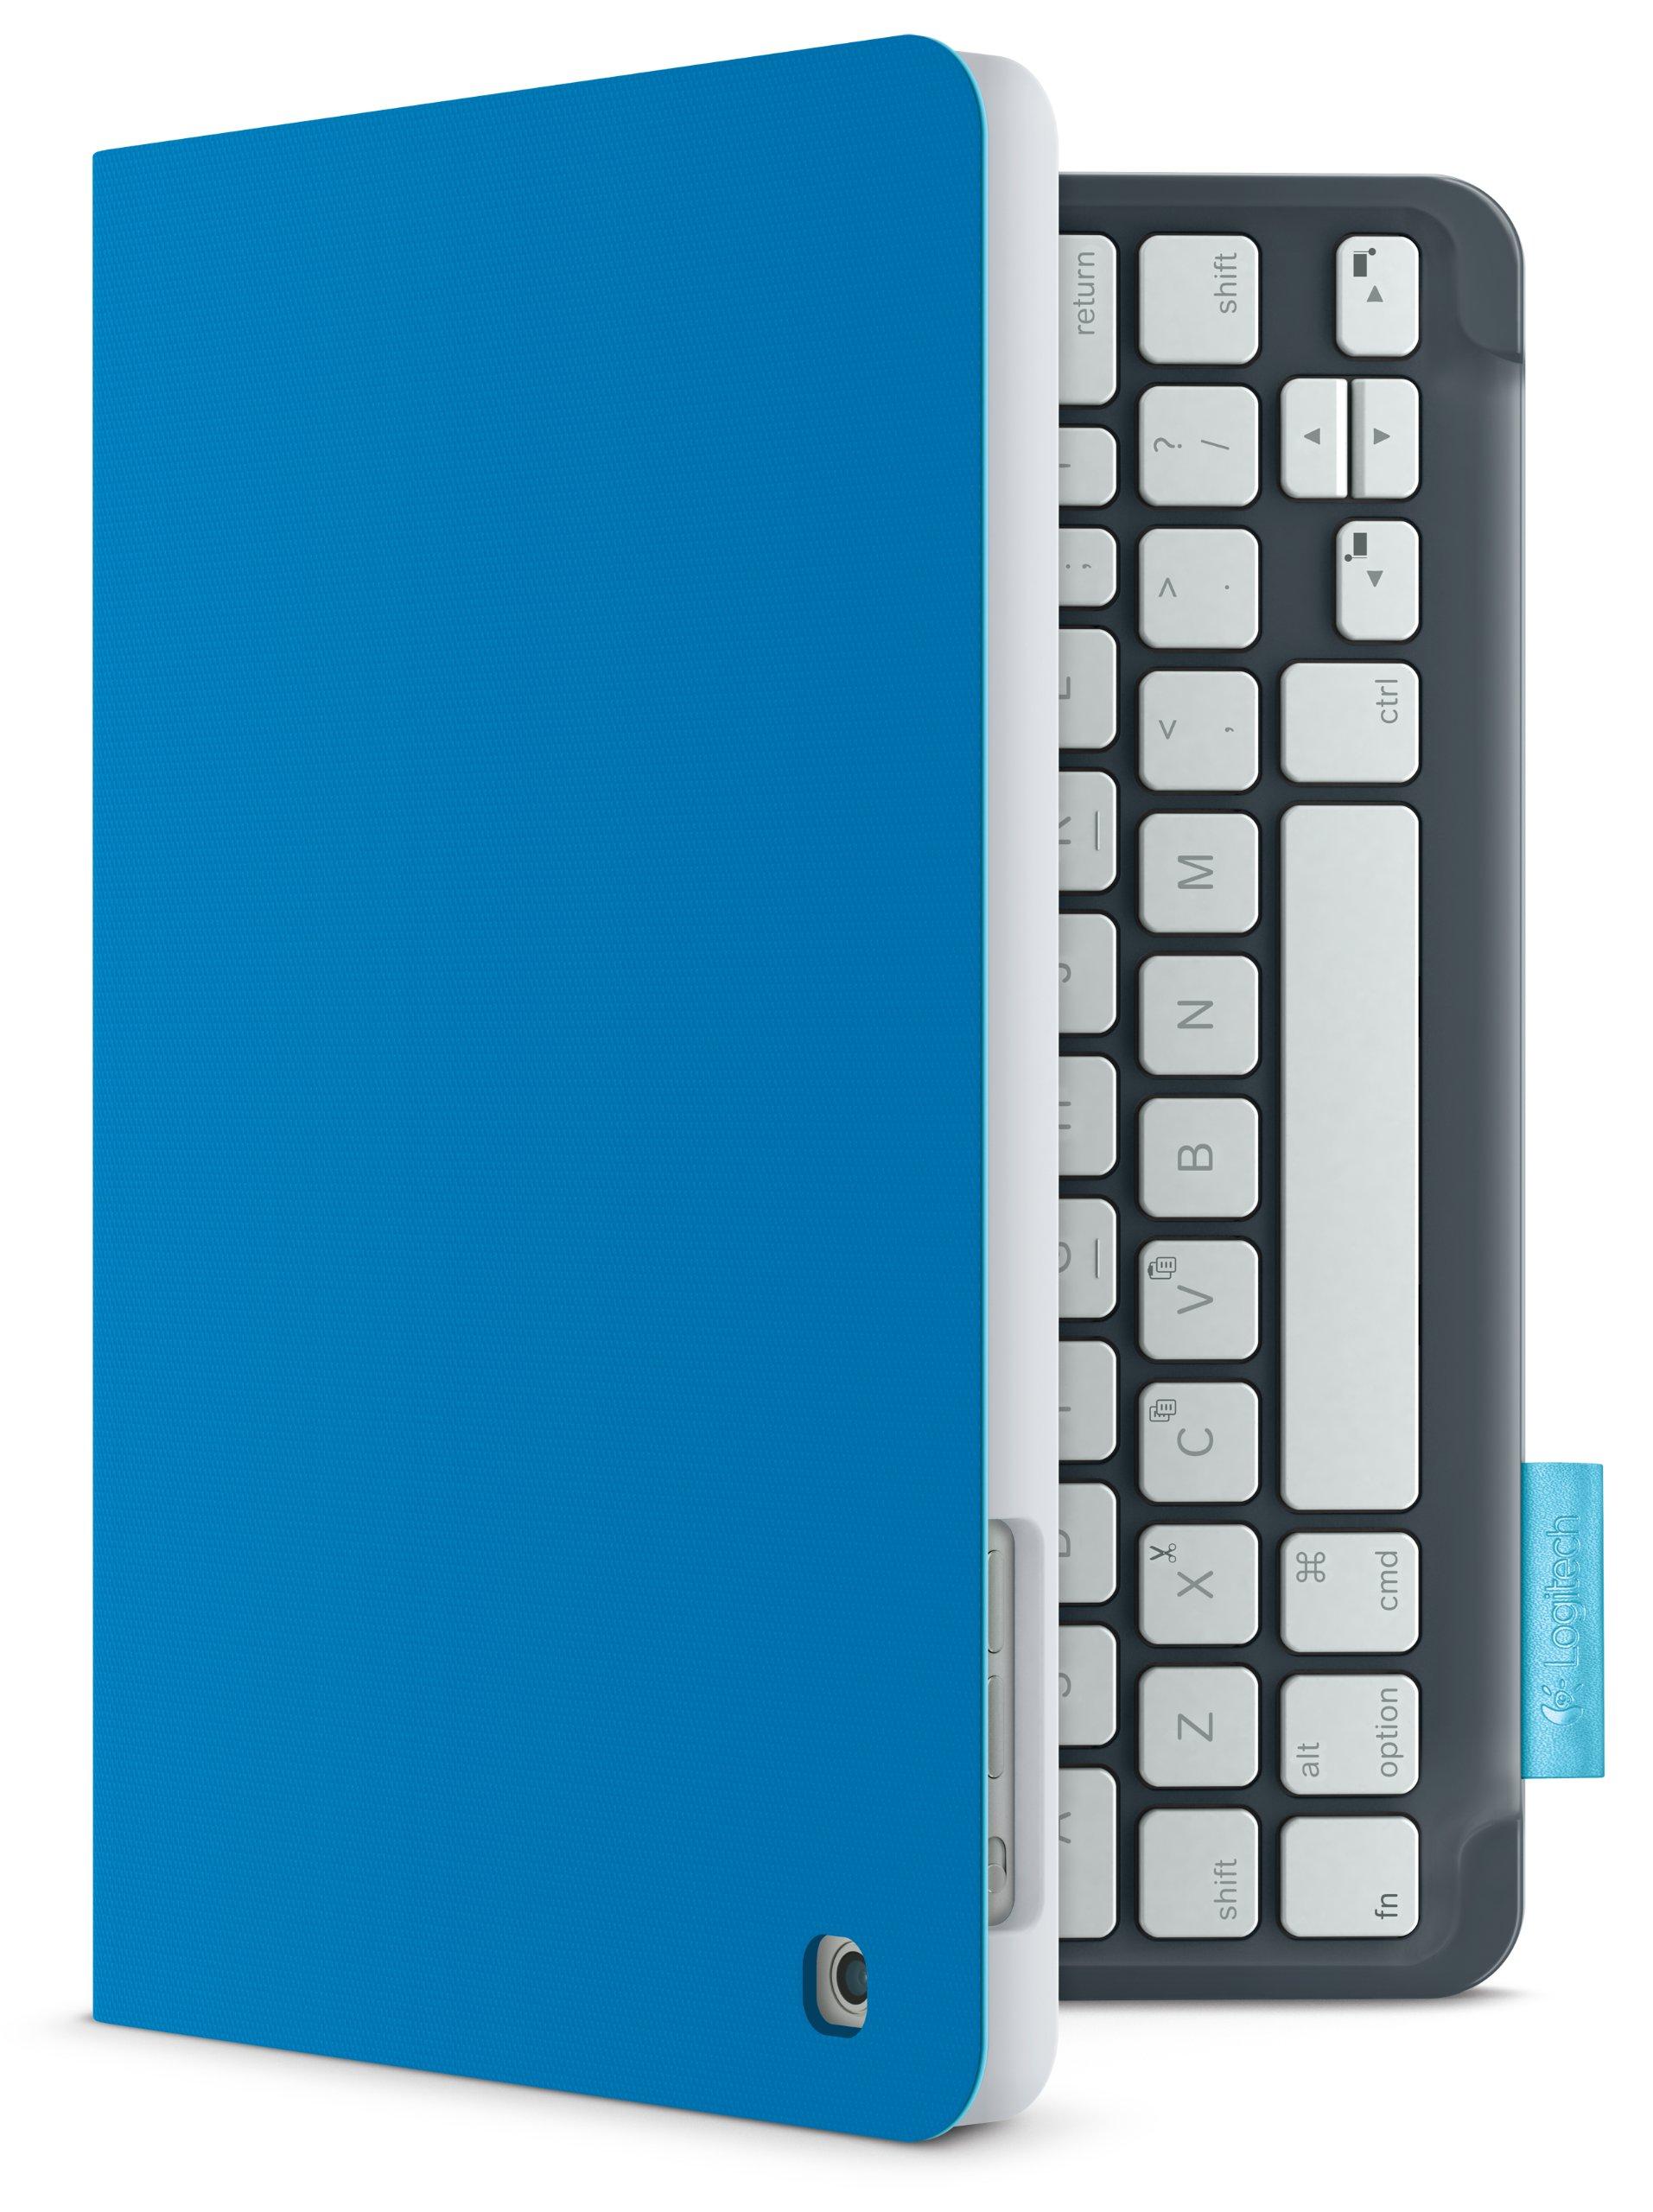 Logitech Keyboard Folio for iPad mini - Electric Blue by Logitech